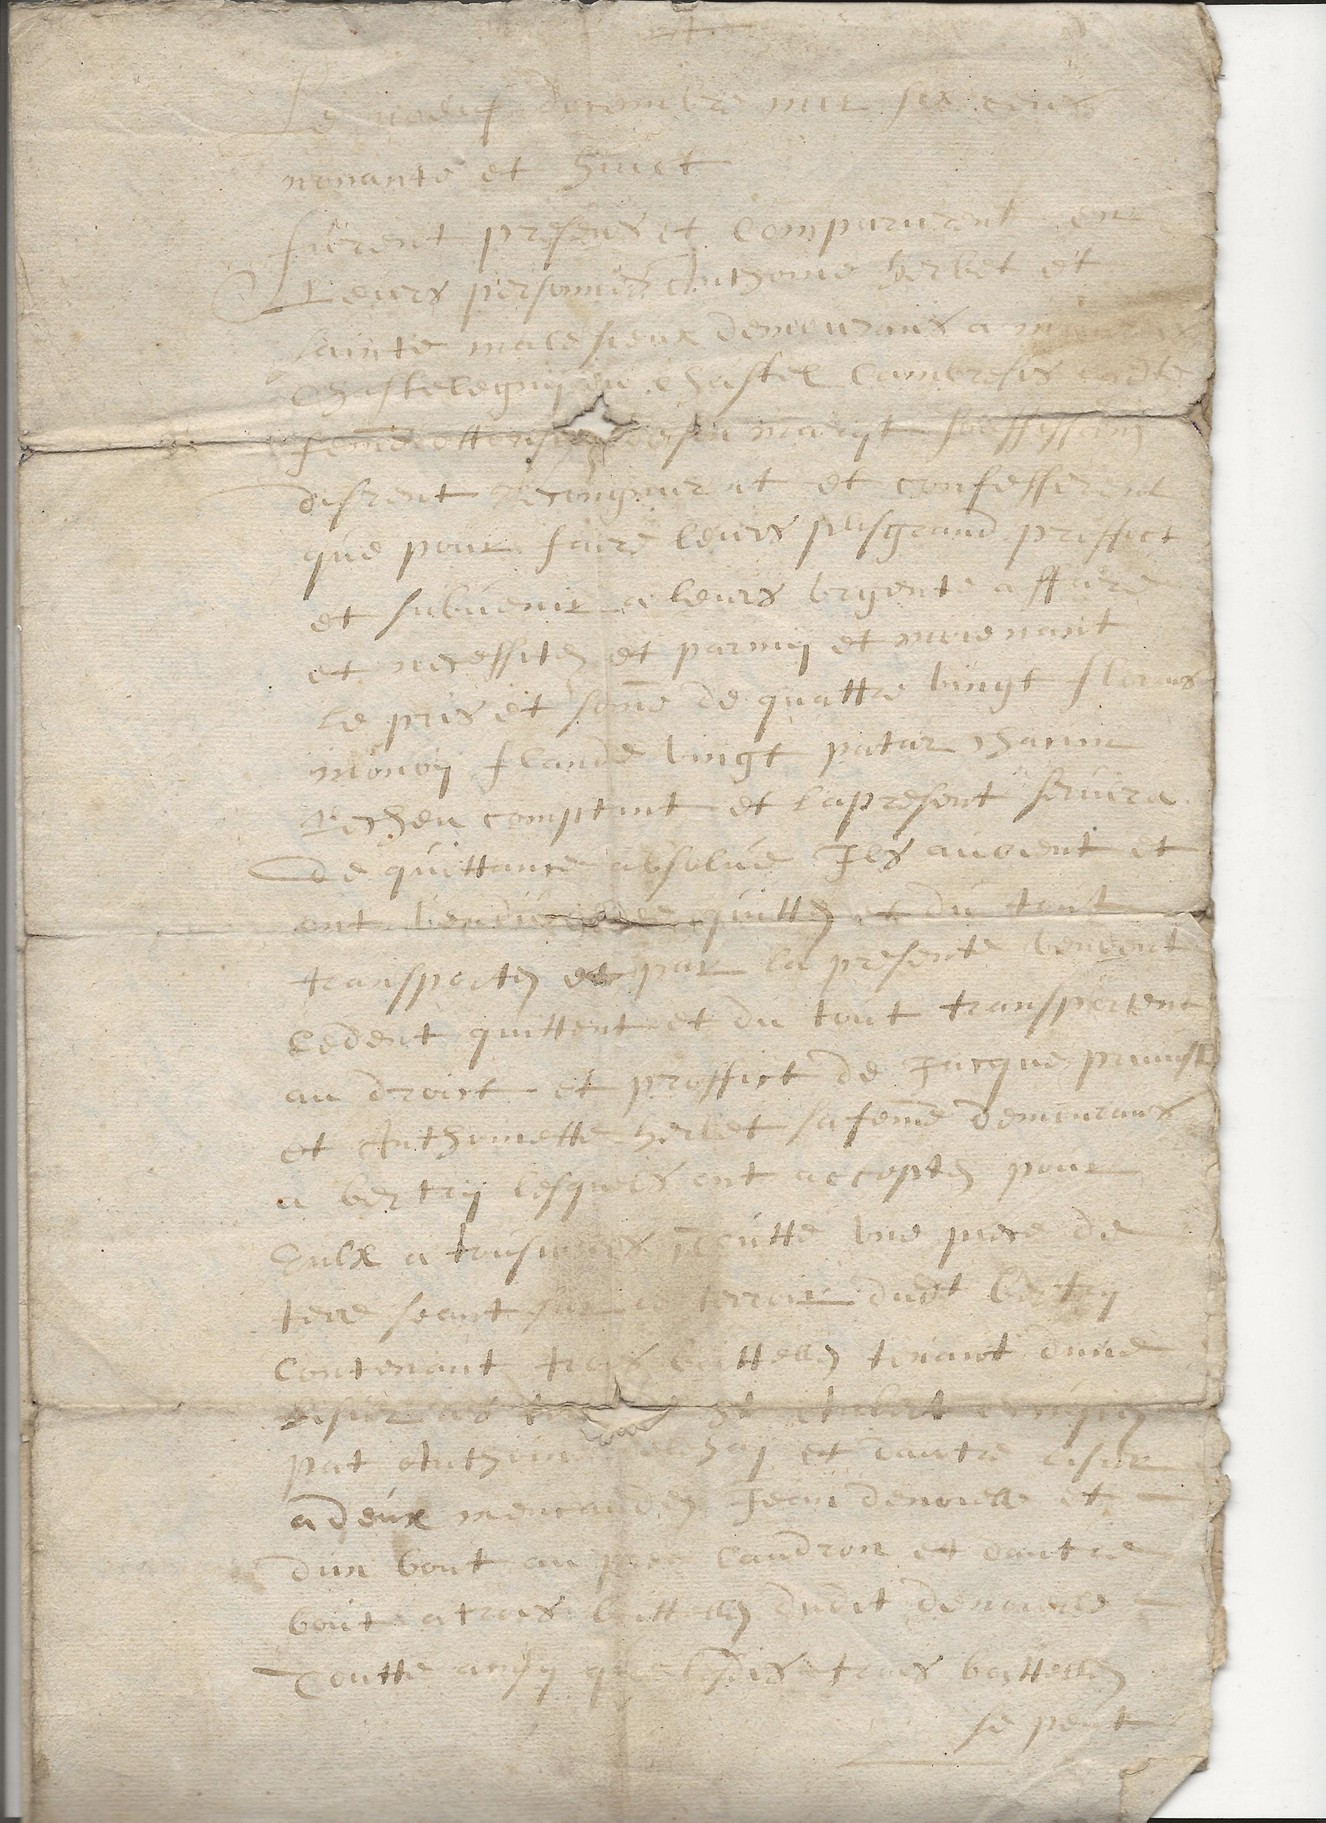 1697 acte concernant jean pruvot 4